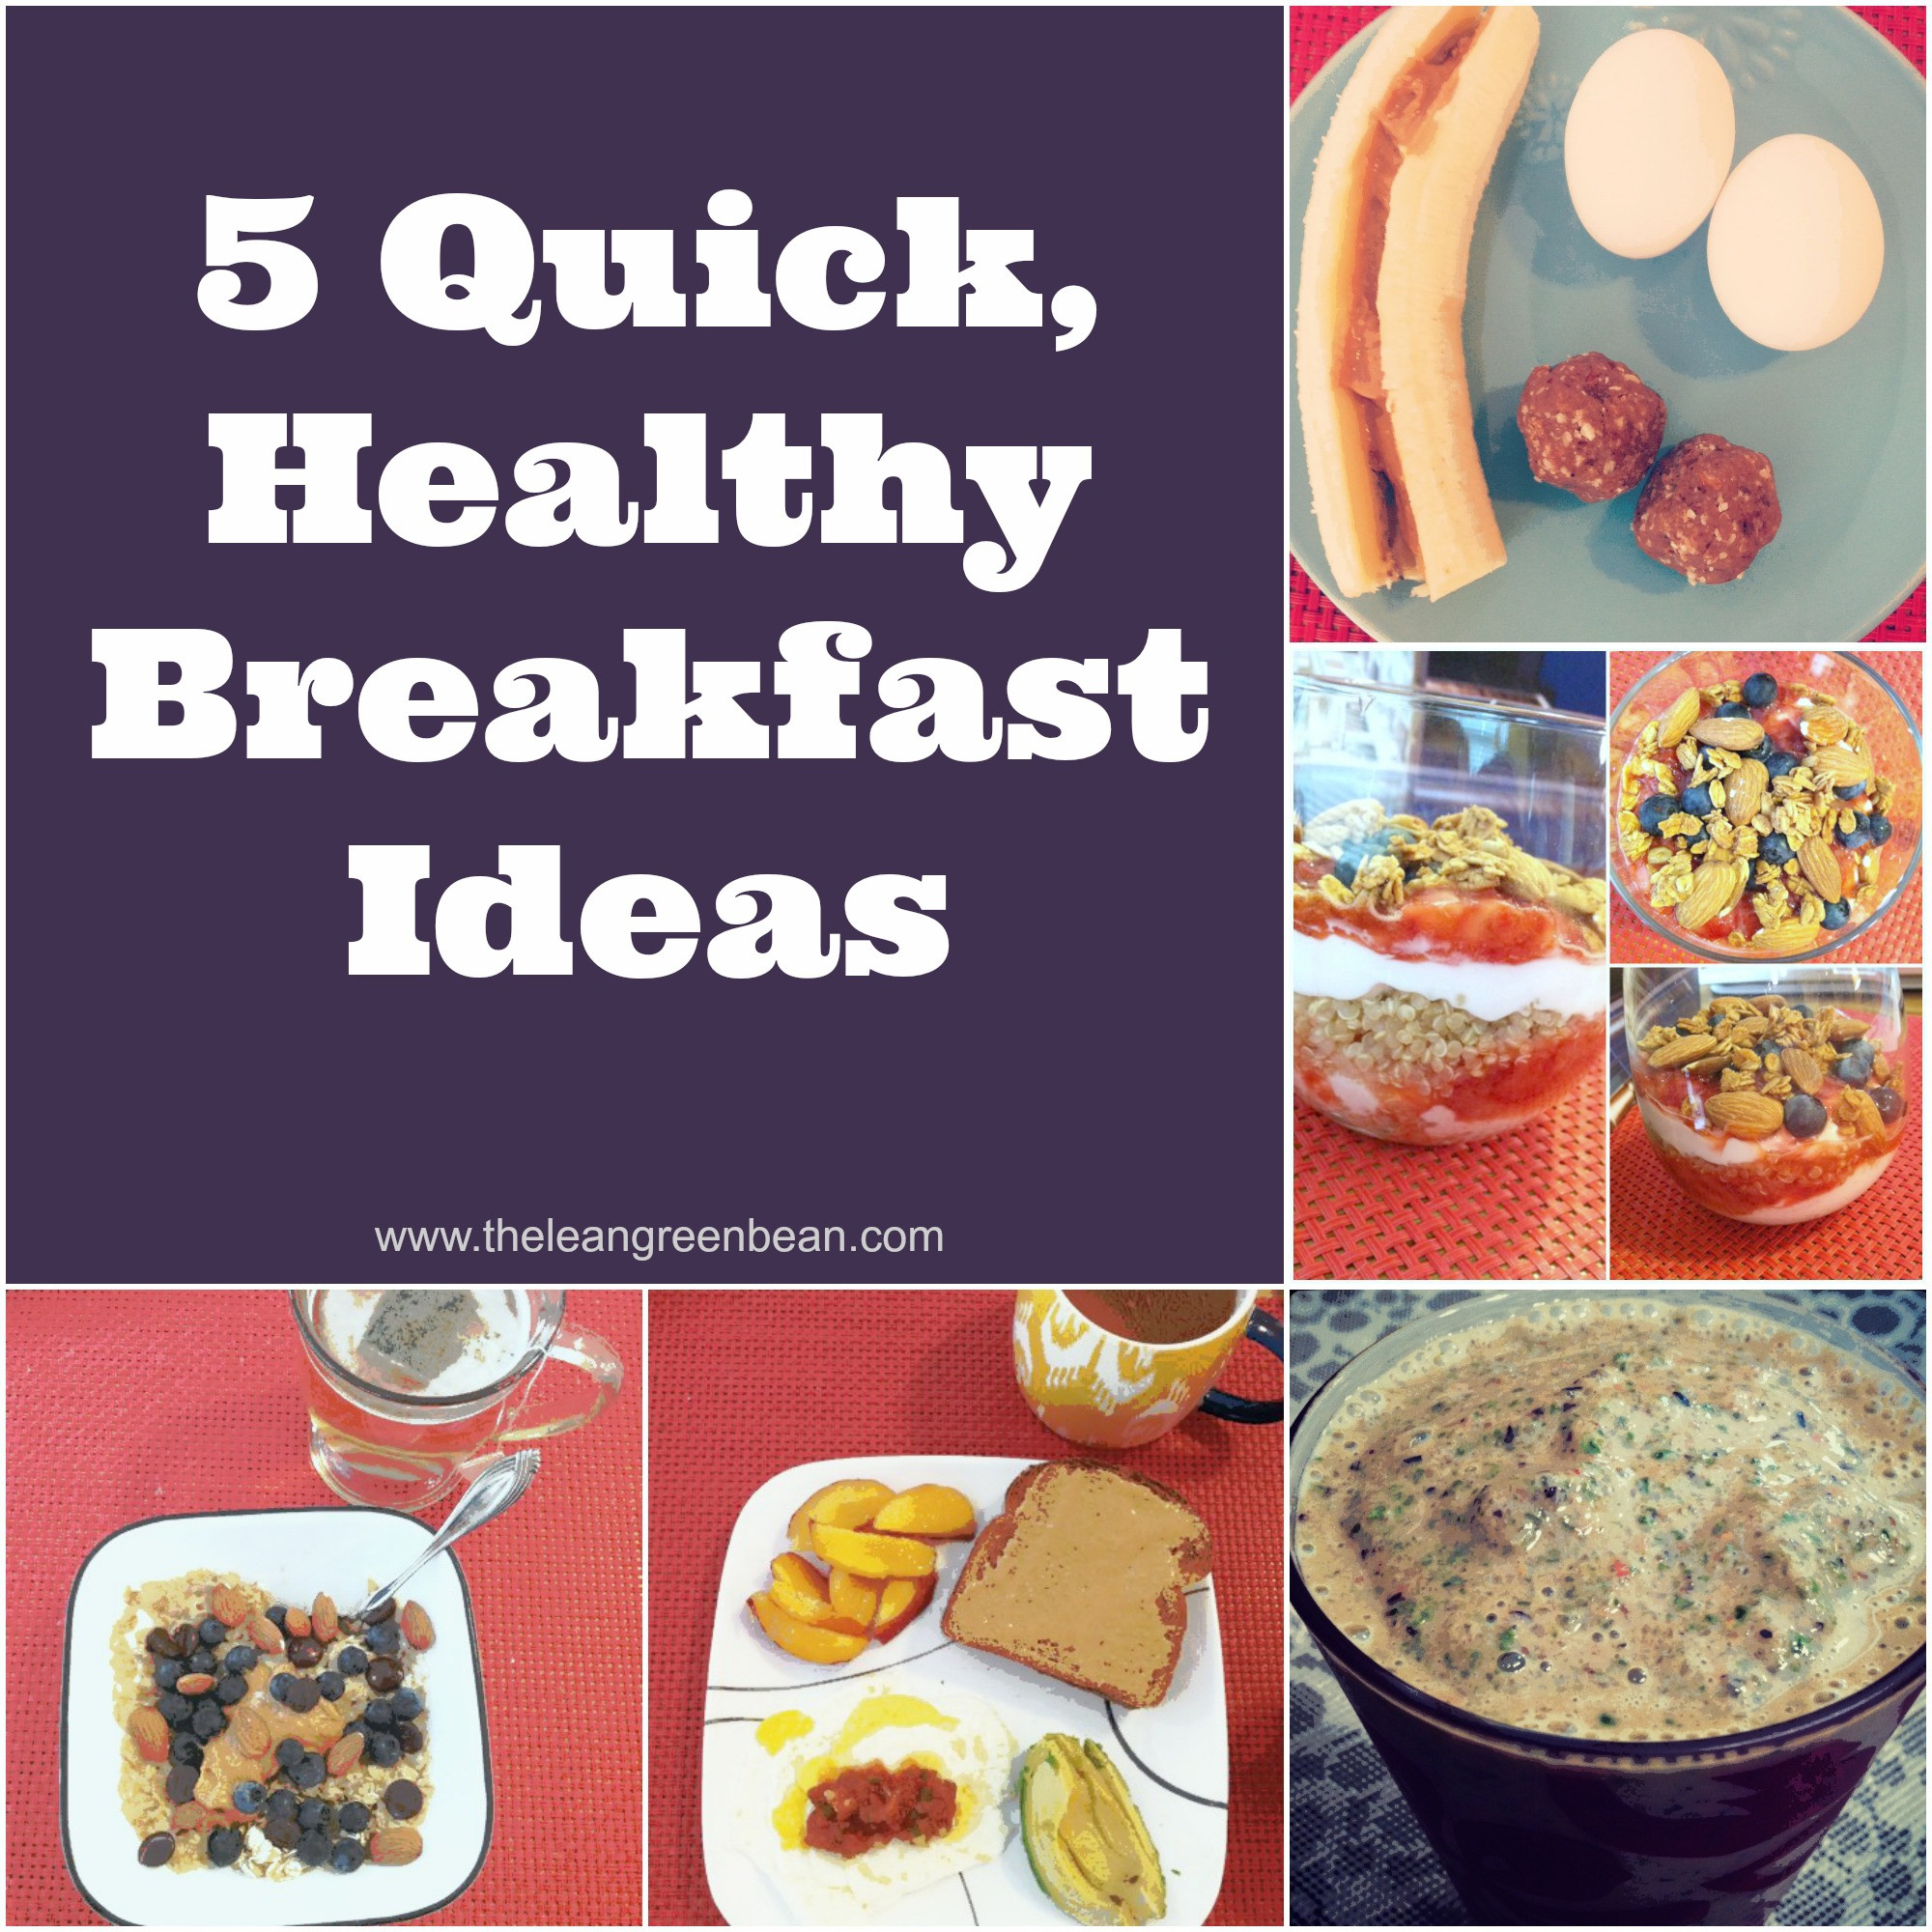 Easy Breakfast Healthy  5 Quick Healthy Breakfast Ideas from a Registered Dietitian